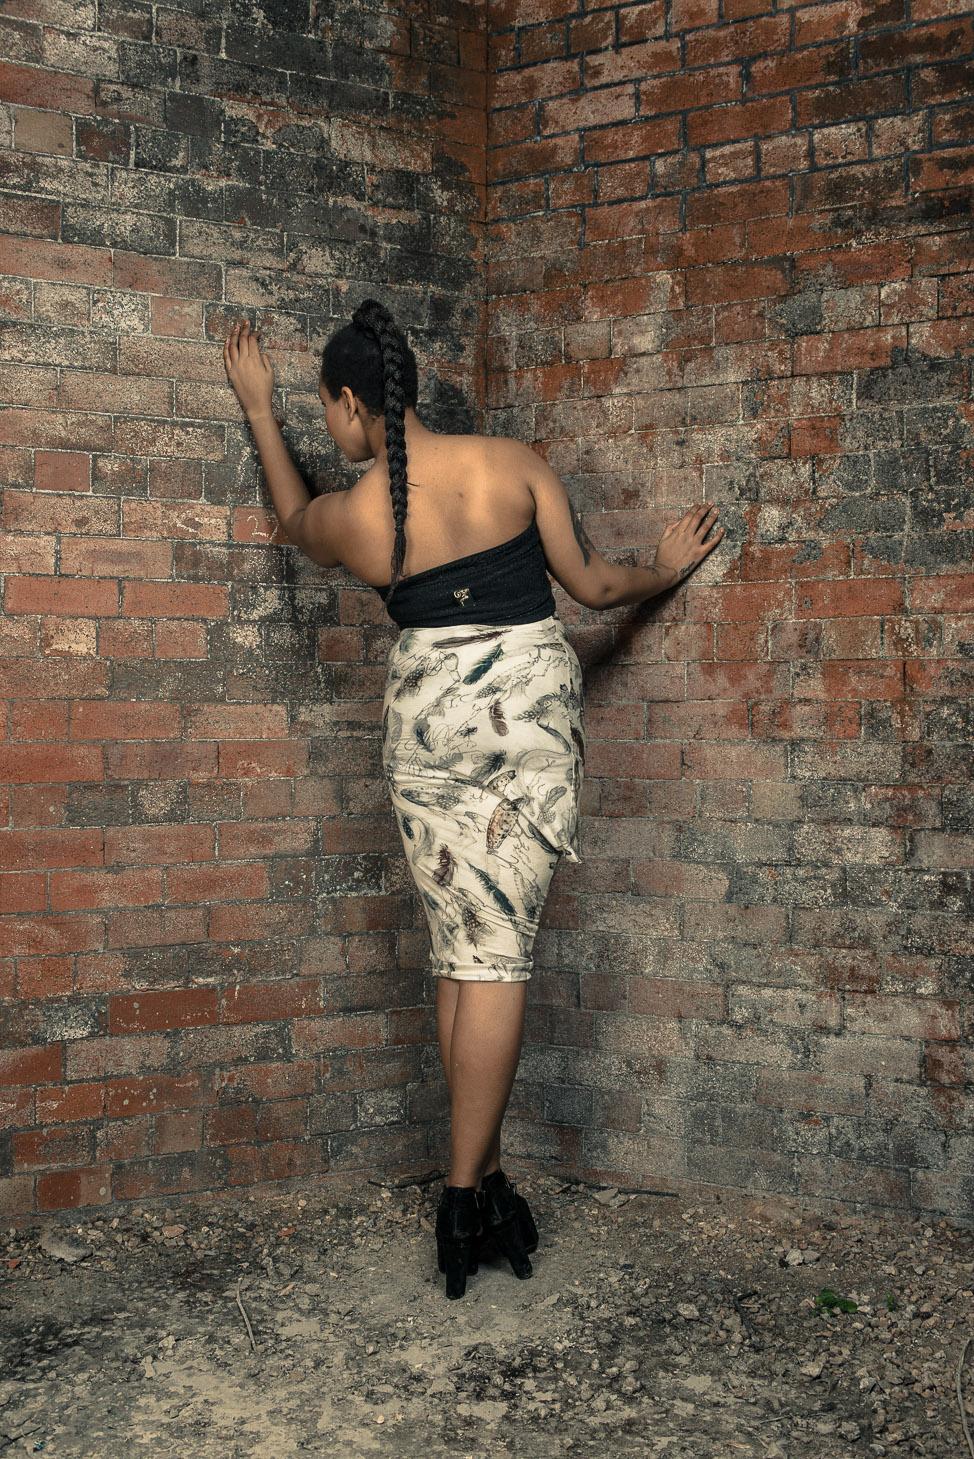 zaramia-ava-zaramiaava-leeds-fashion-designer-ethical-sustainable-tailored-minimalist-skirt-print-bandeau-maxi-versatile-drape-grey-bodysuit-black-obi-belt-wrap-cowl-styling-womenswear-models-38